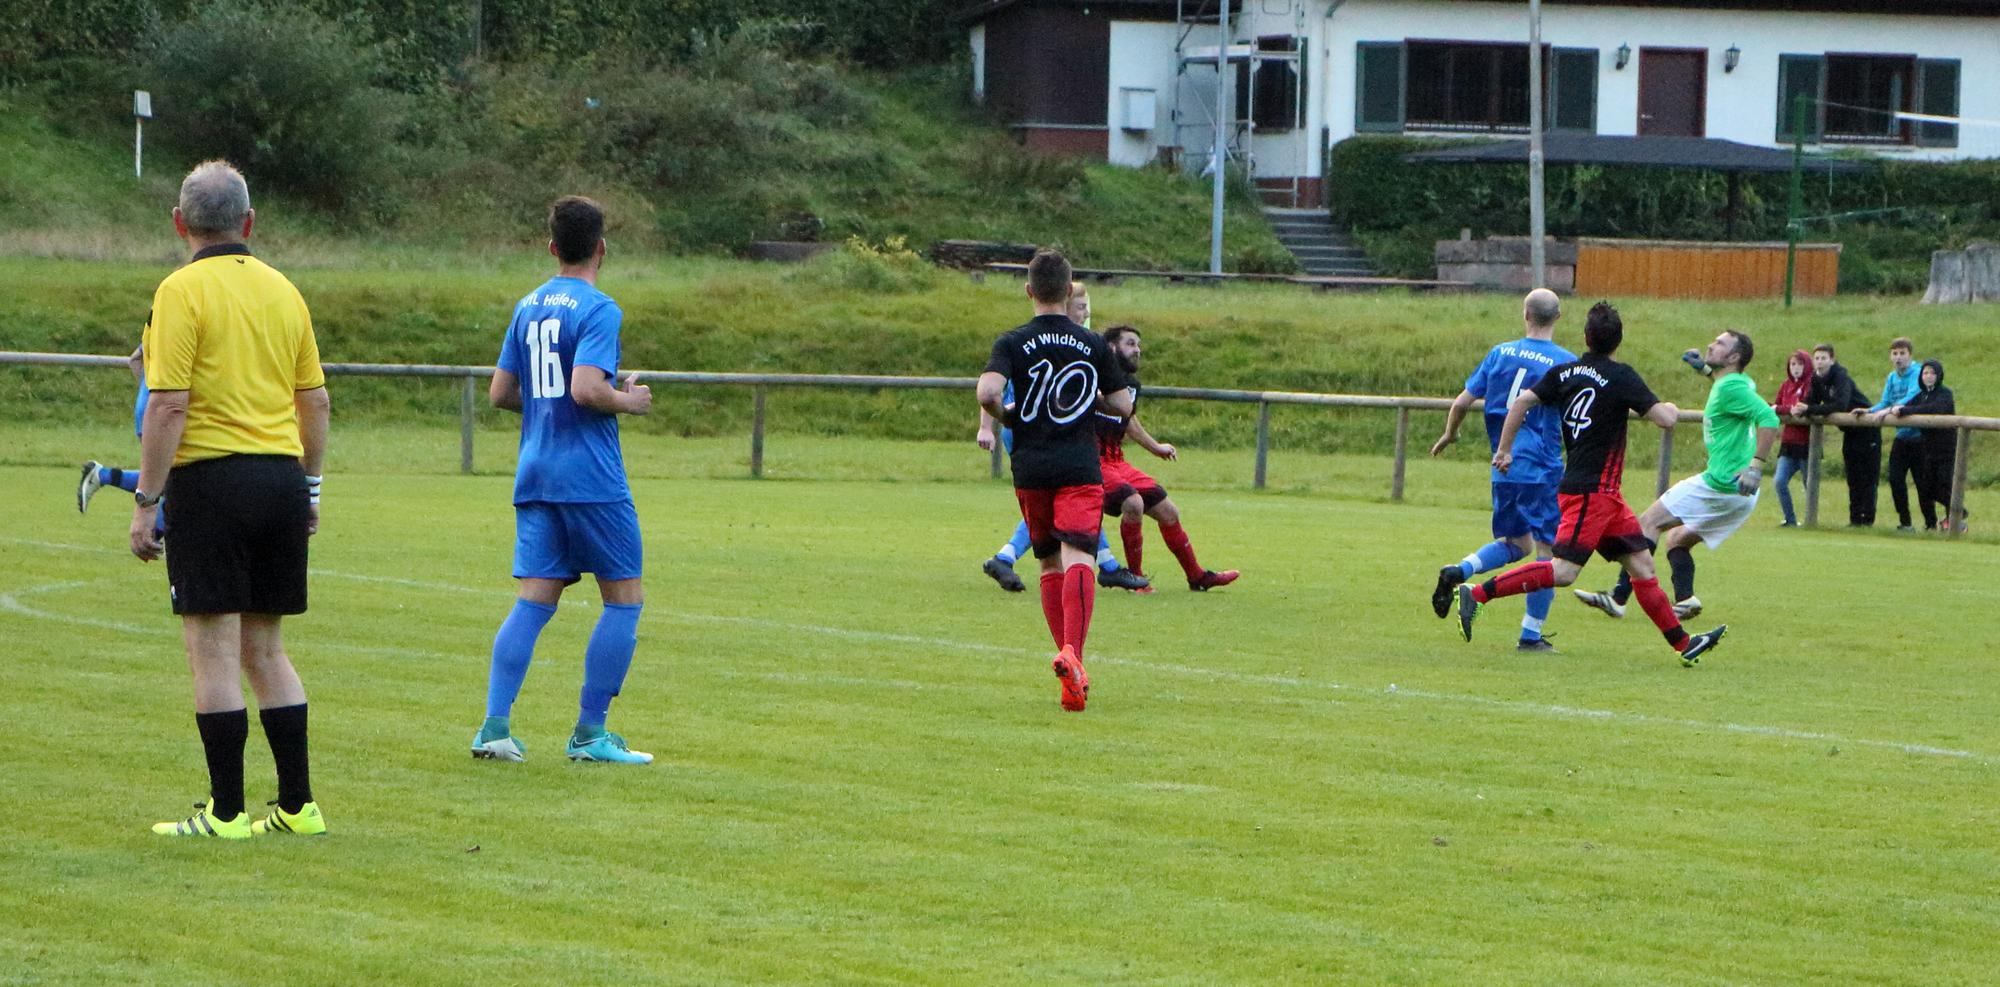 2017-09-23_VfL-Wildbad-M1_14